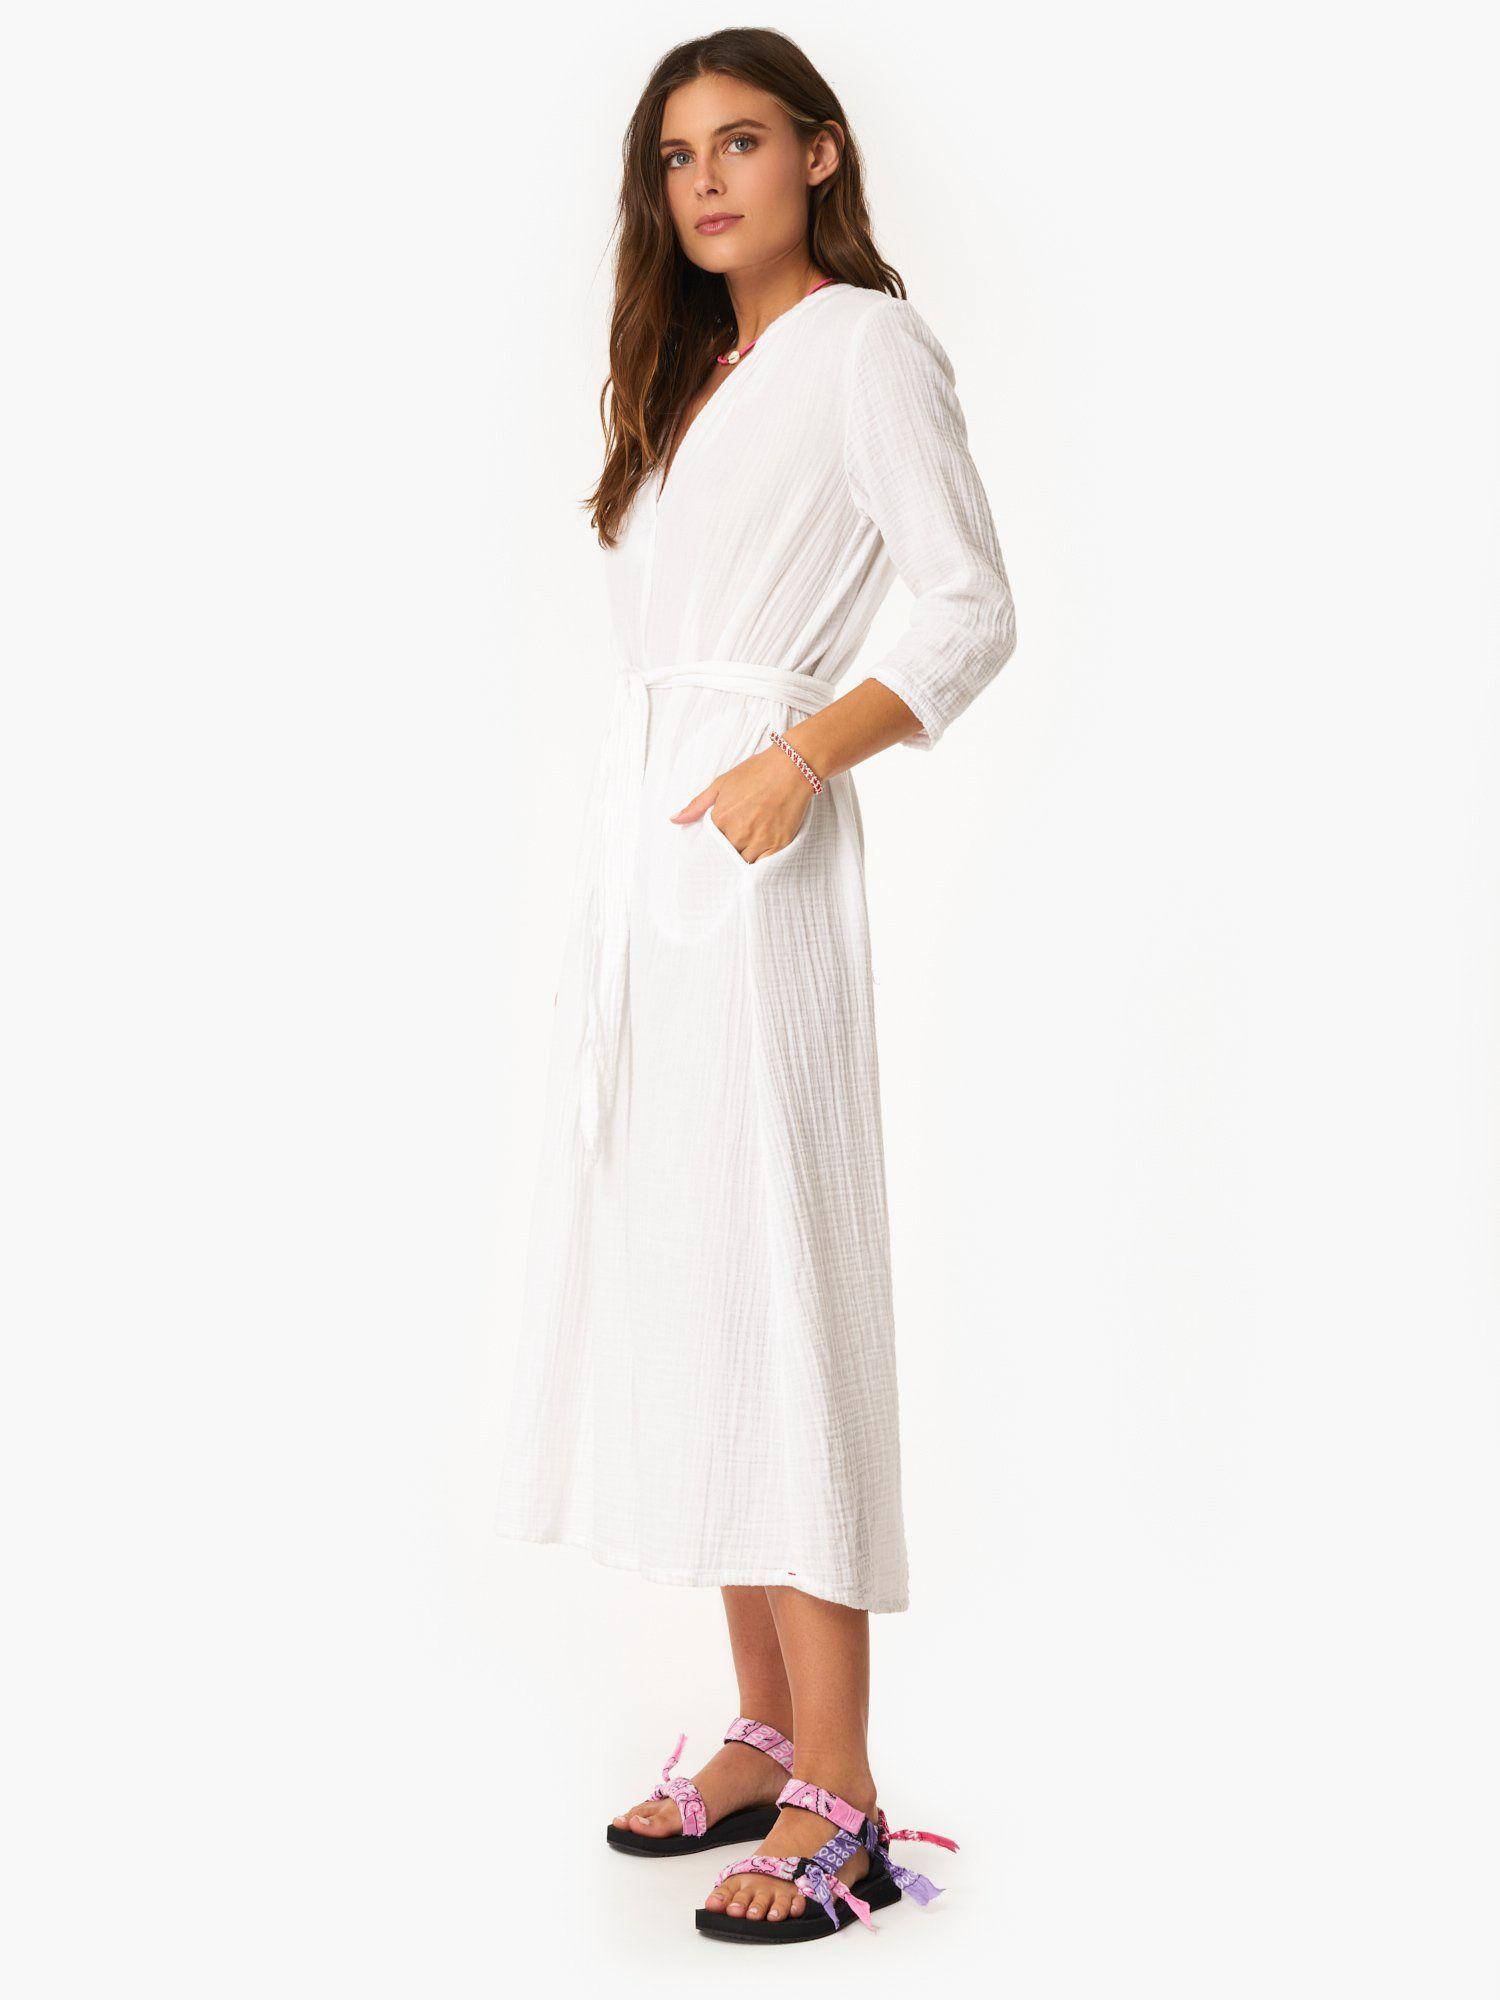 White Joni Dress Midi Dress With Sleeves Cotton Gauze Dress Dresses [ 2000 x 1500 Pixel ]